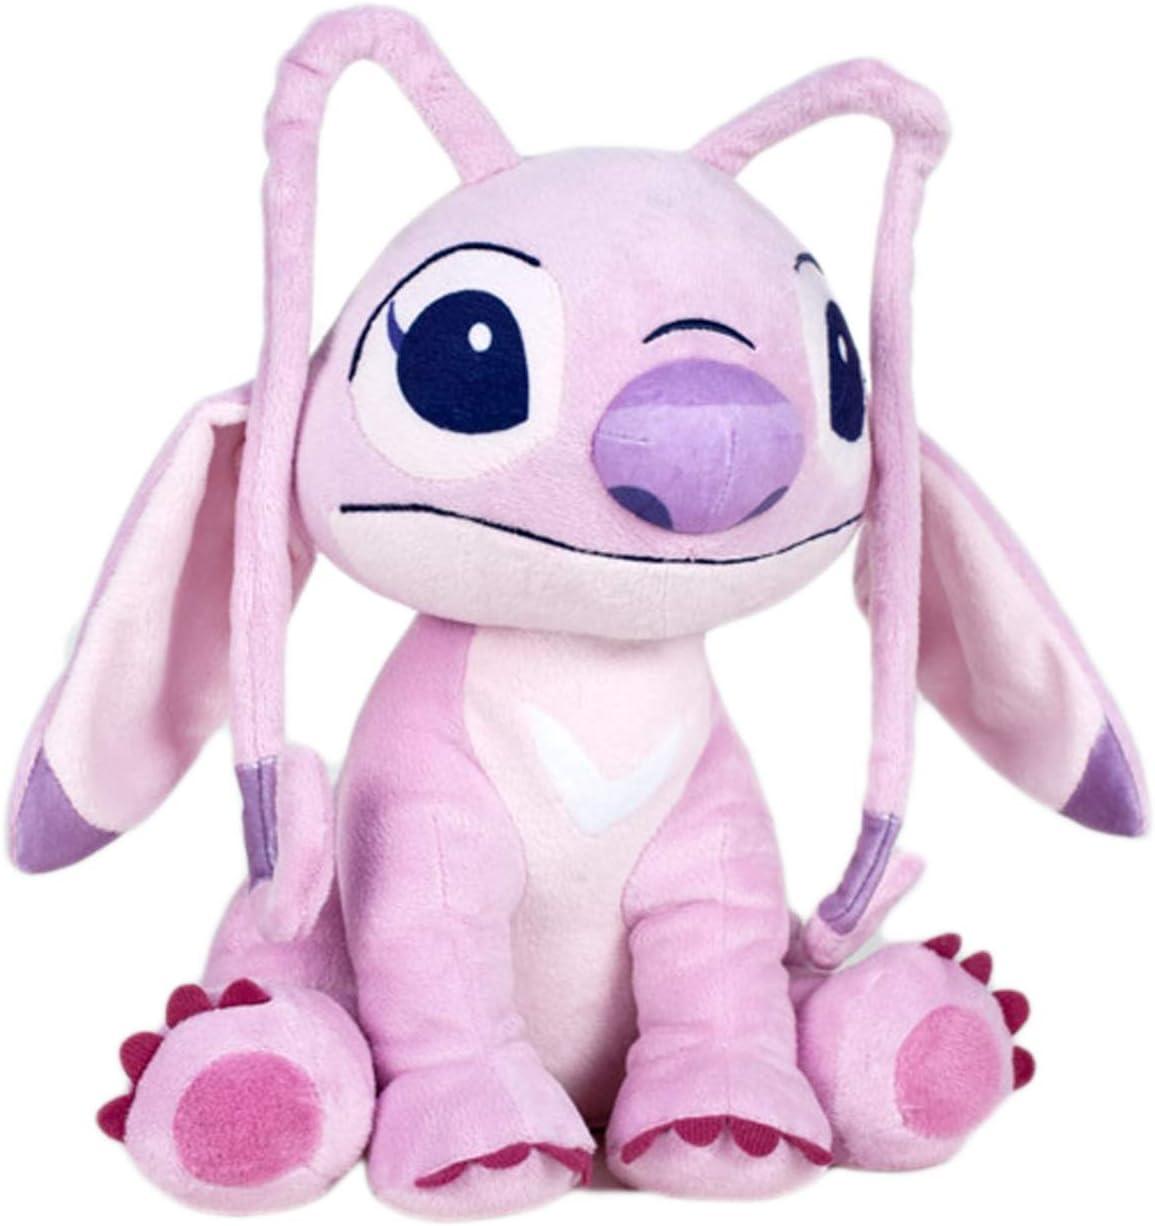 Peluche angel stitch 30 cm by Disney